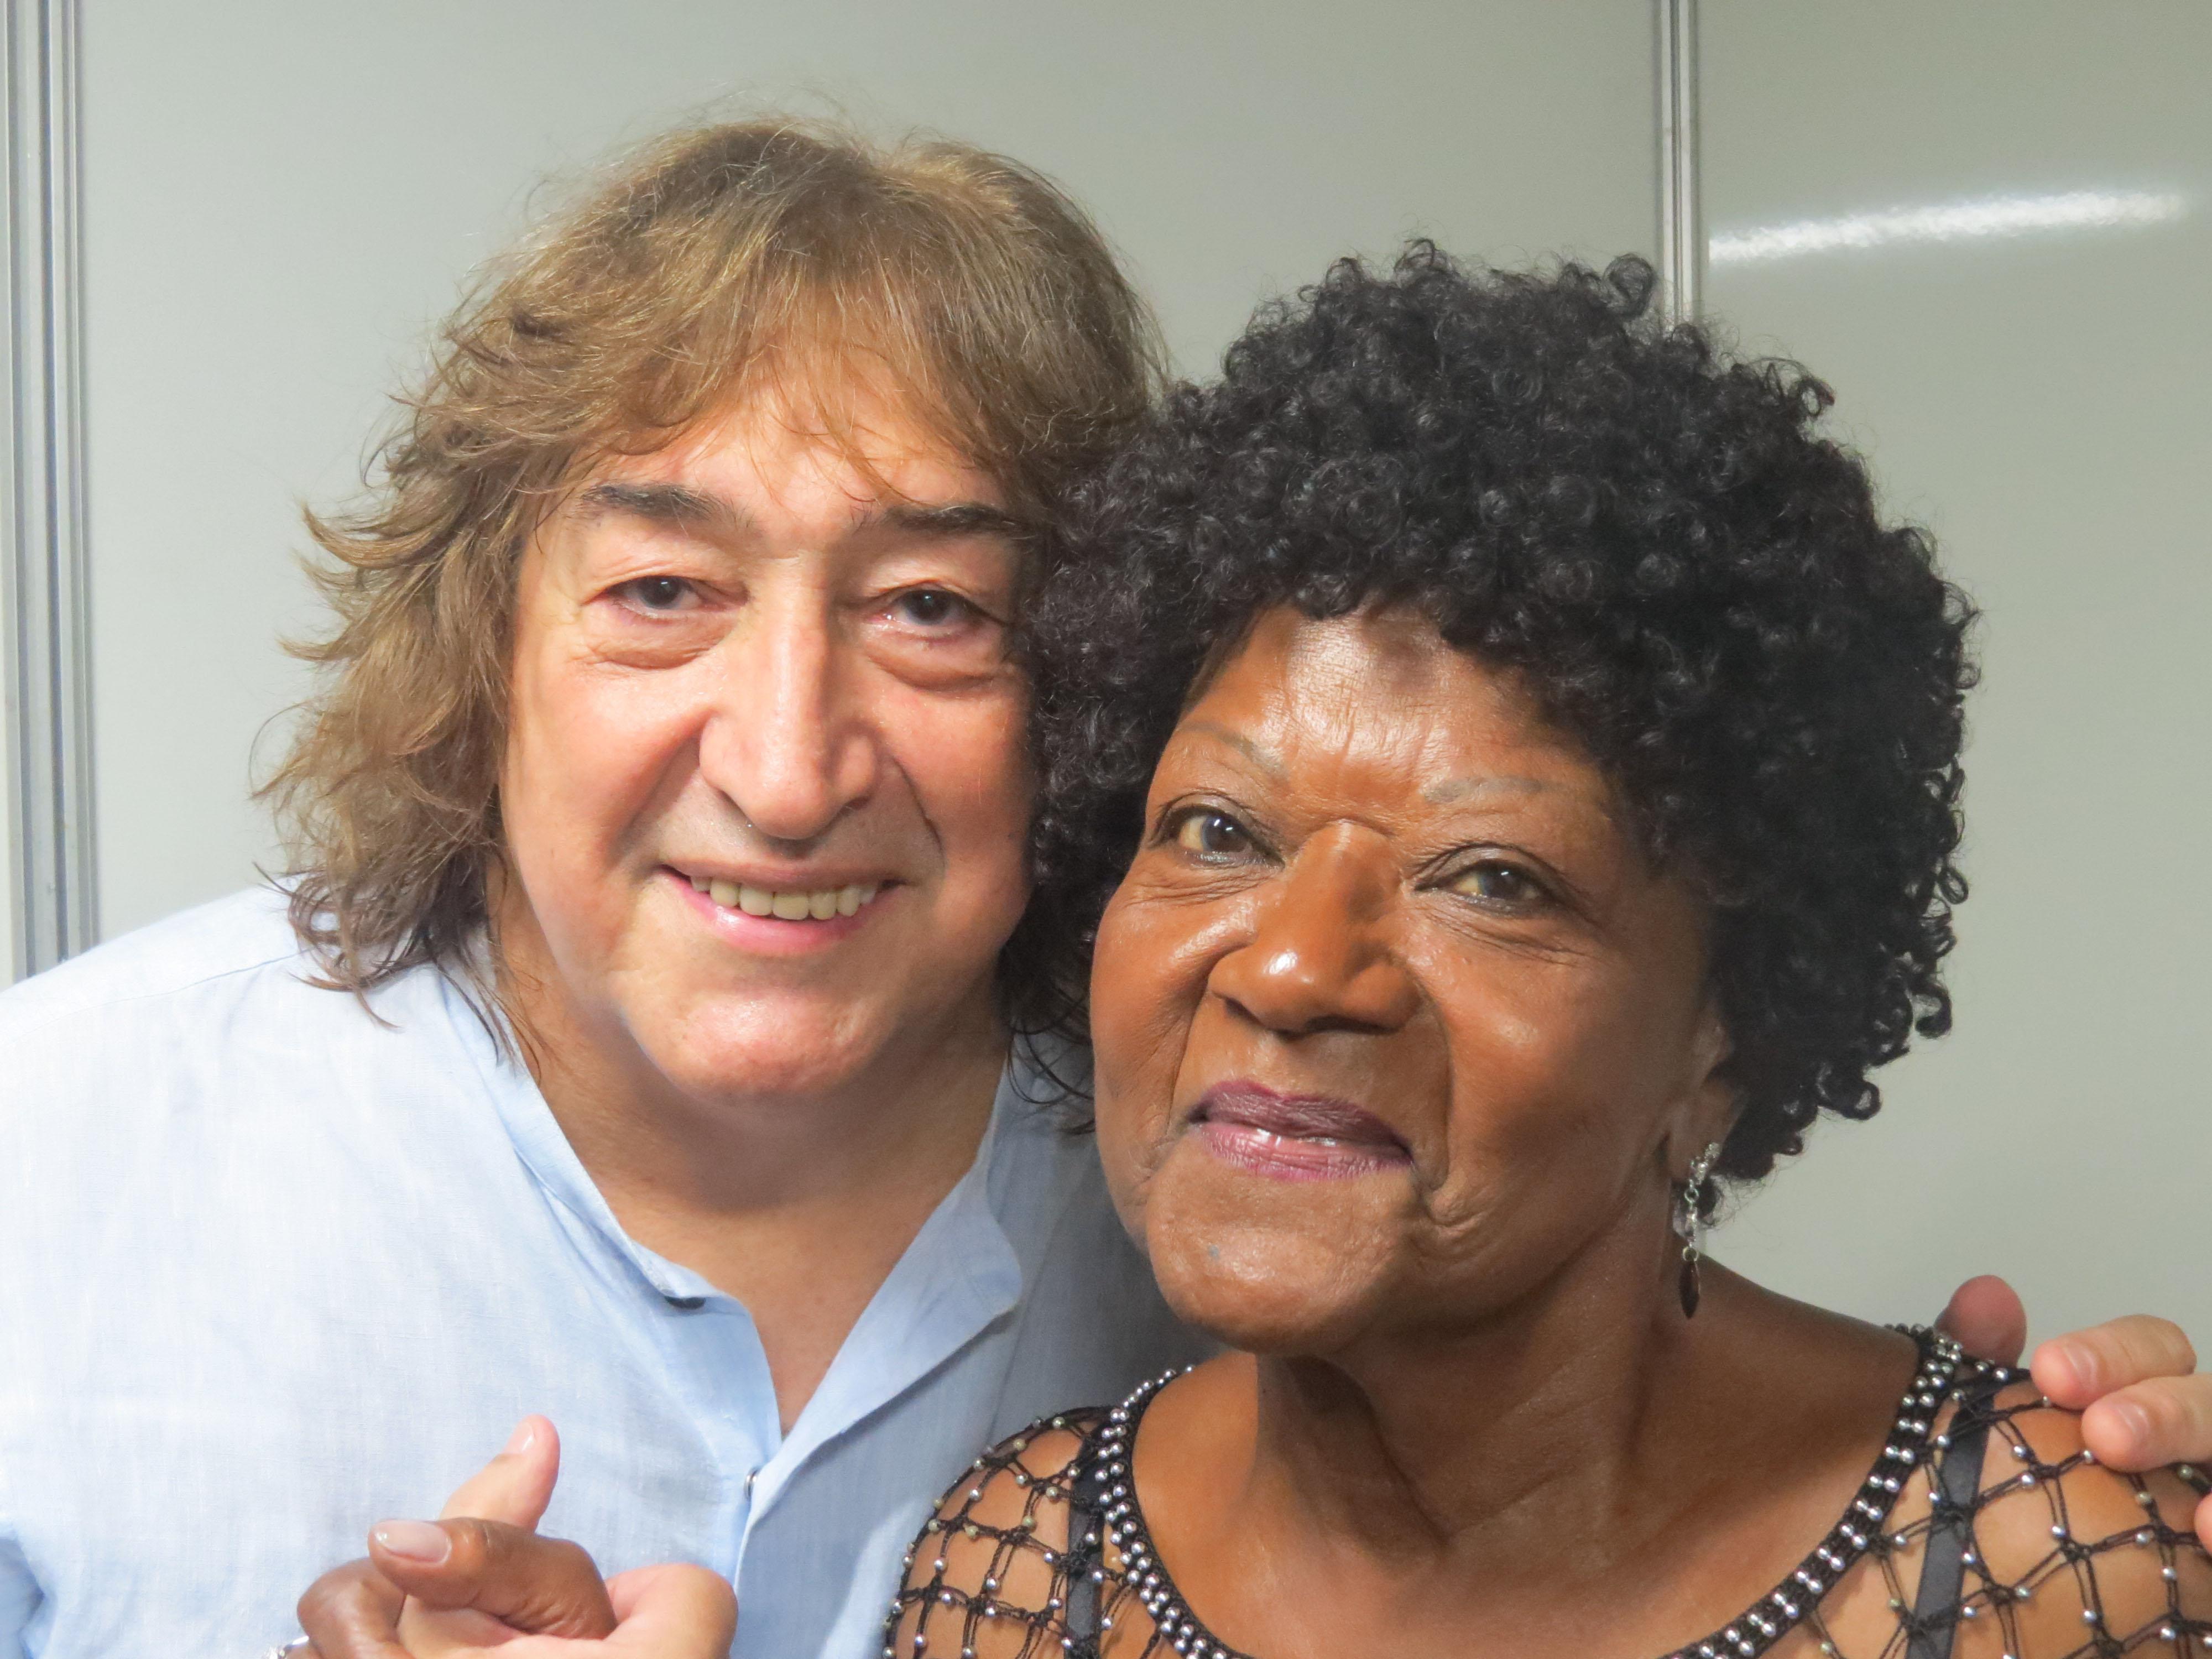 Toninho Horta e Alaíde Costa